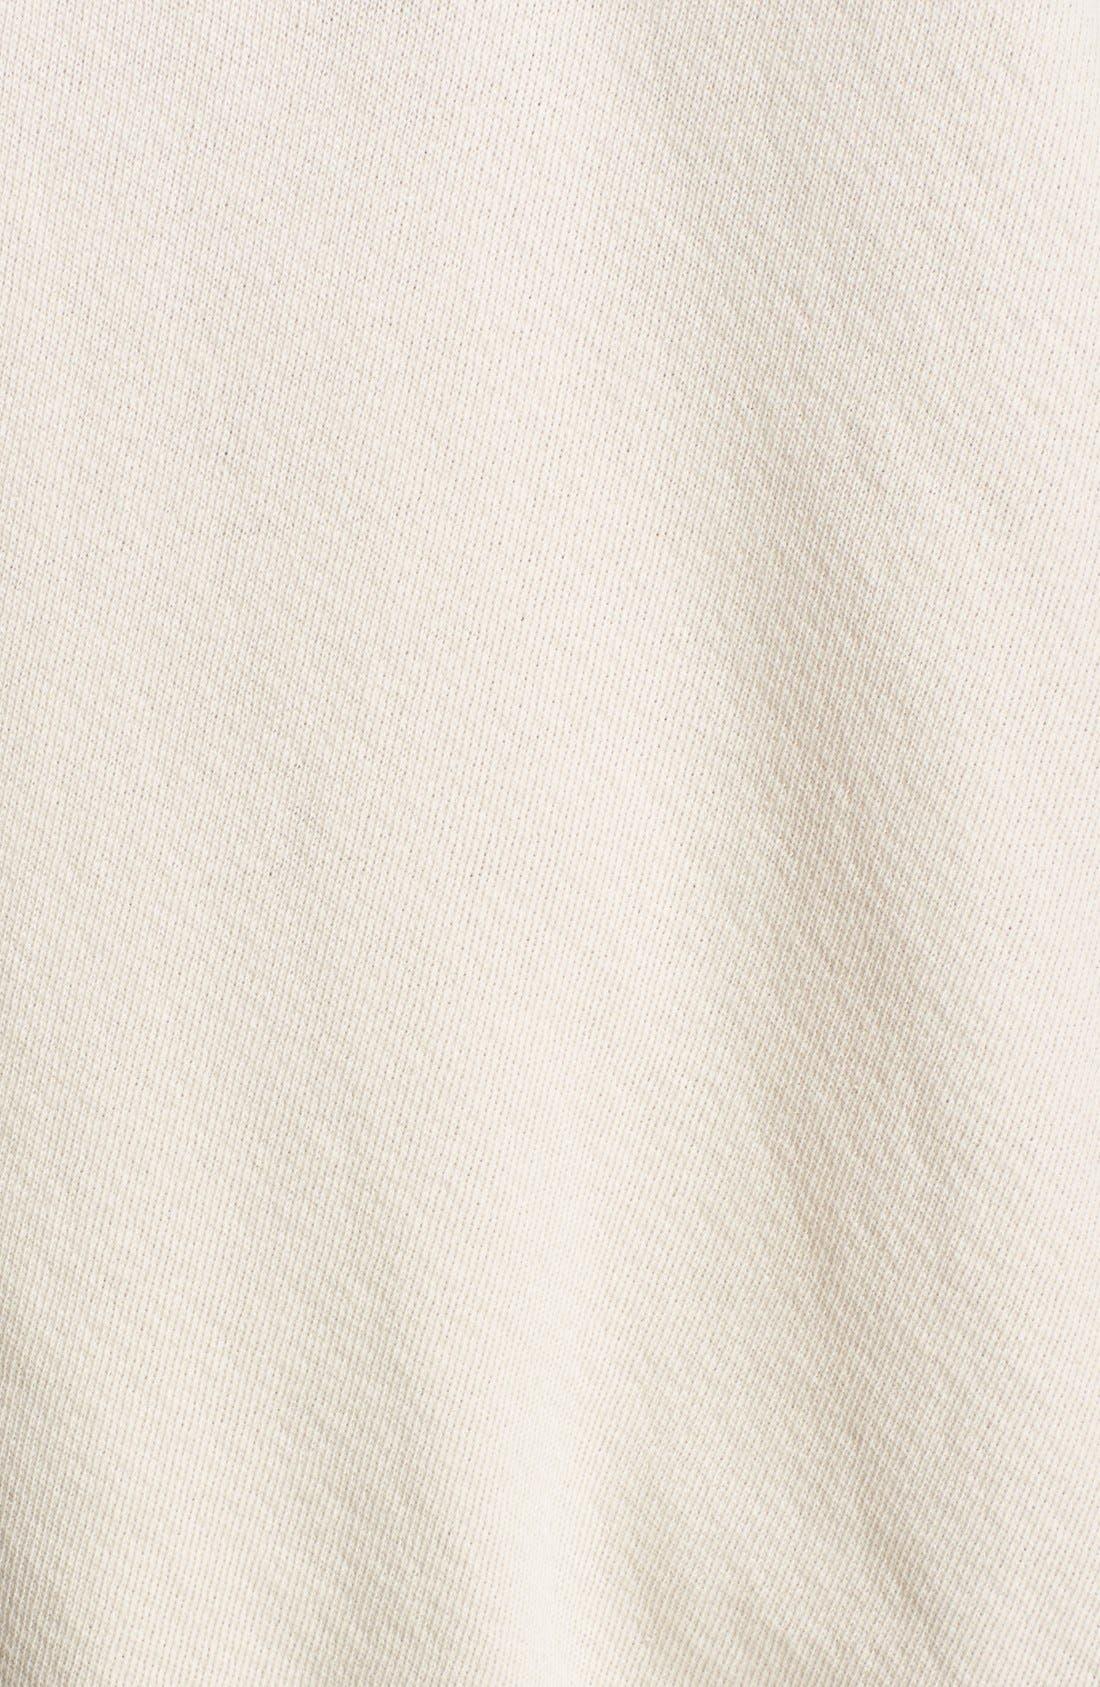 'The Anchor' Sweatshirt,                             Alternate thumbnail 4, color,                             909